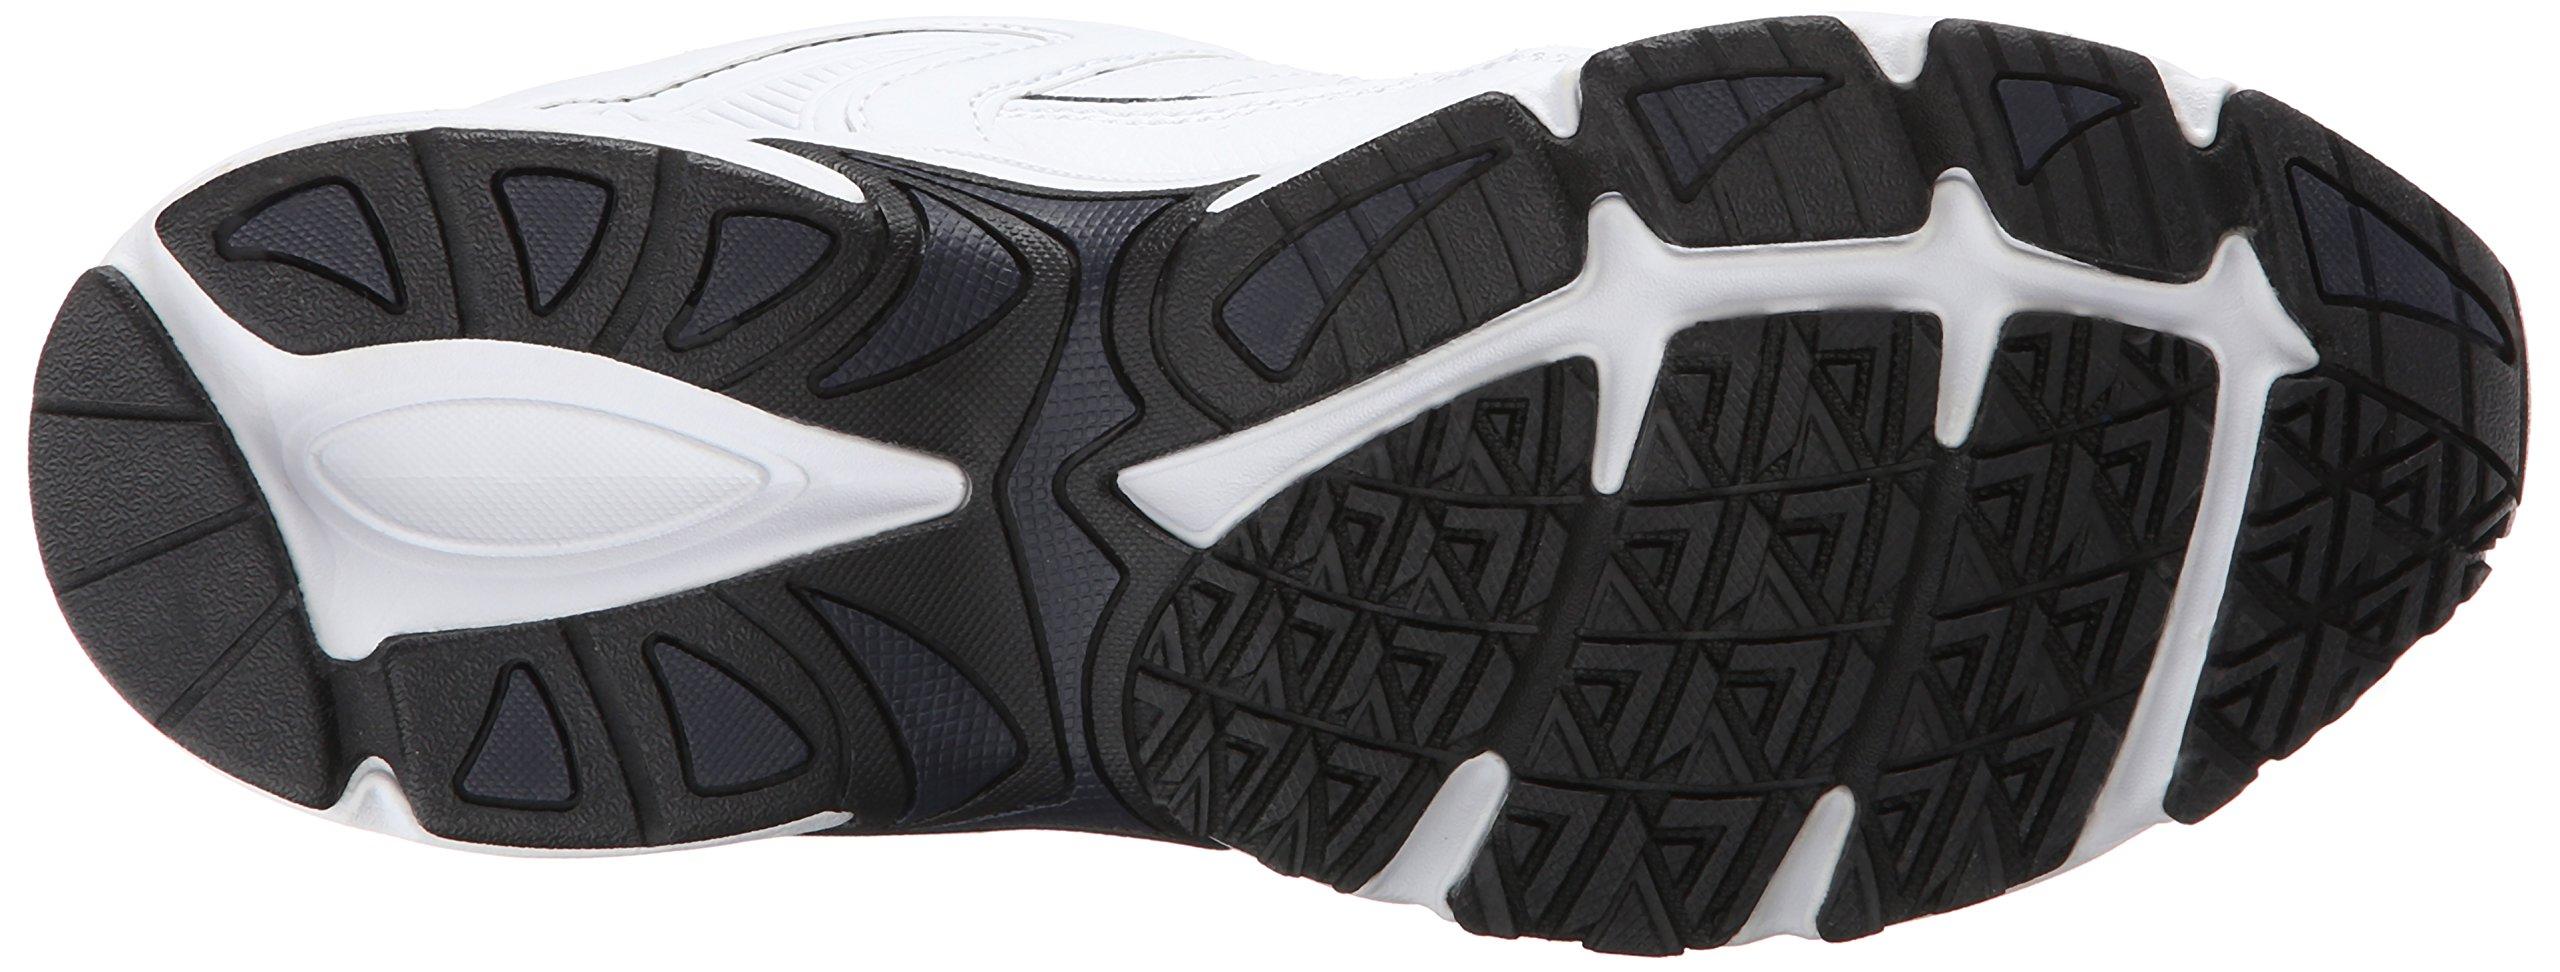 d8fcd71e7600 Fila Men s Memory Sportland Running Shoe